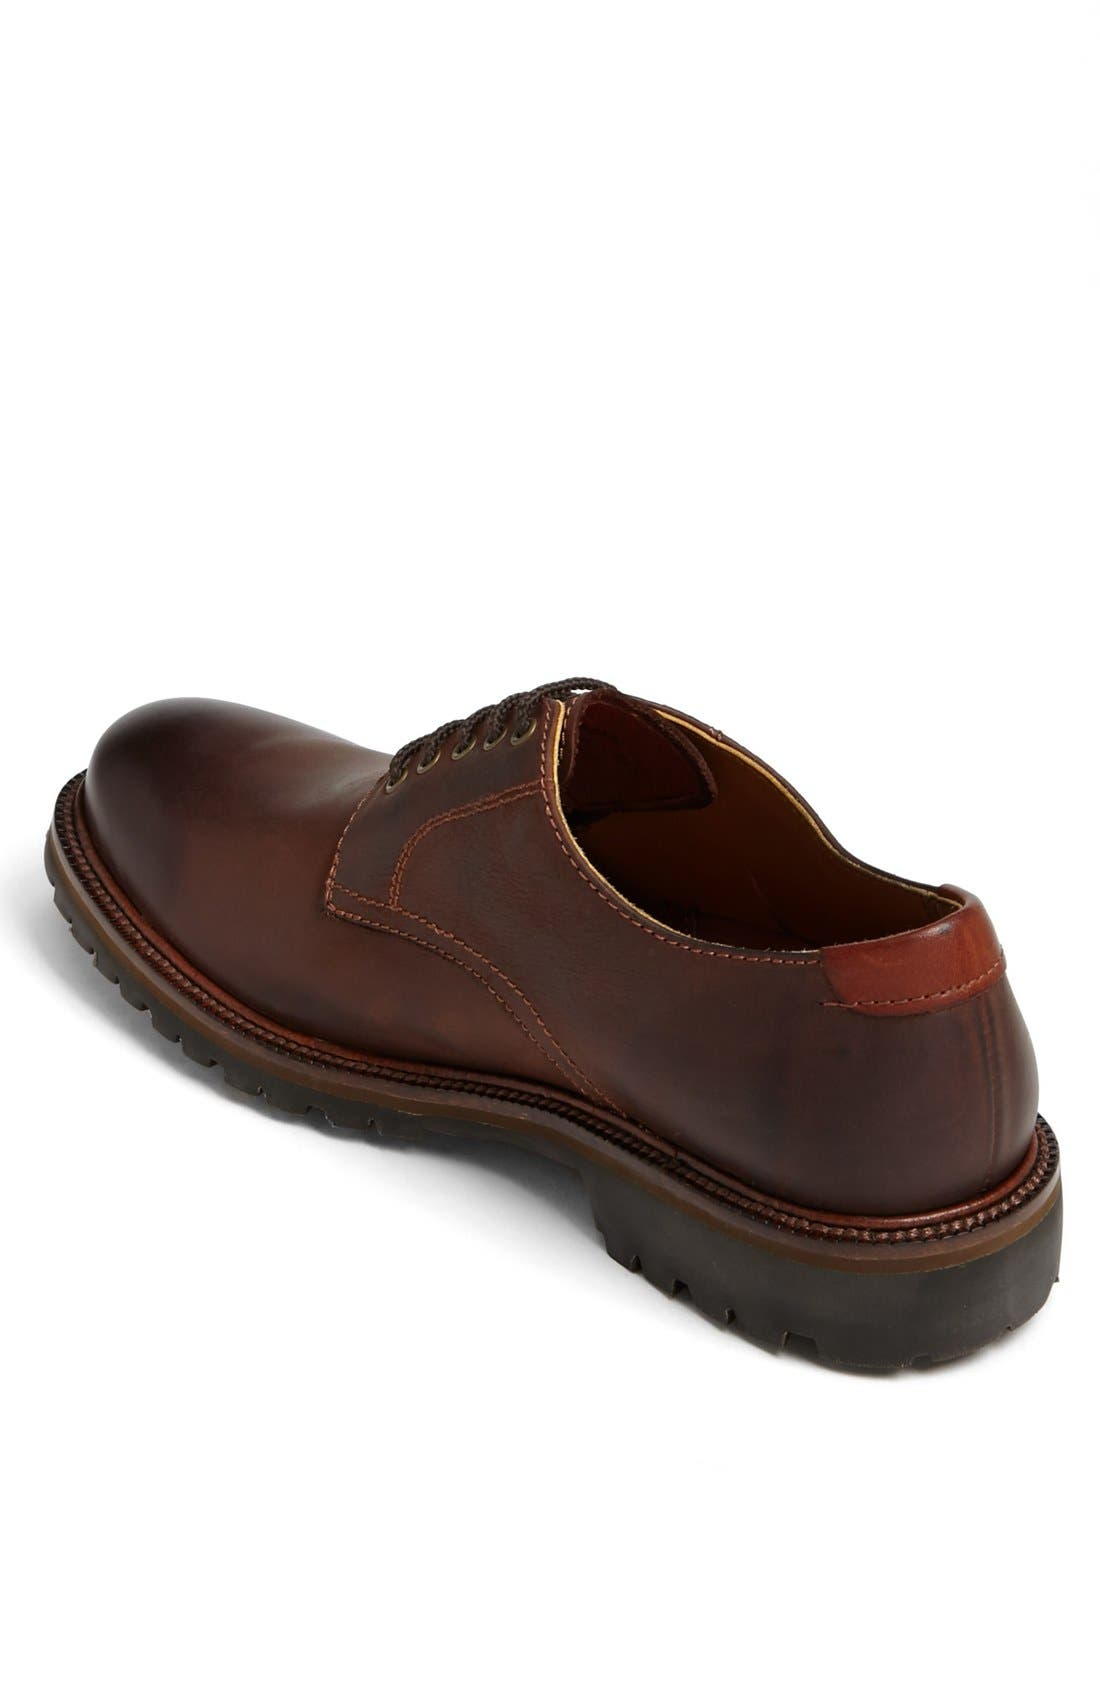 Alternate Image 2  - Trask 'Gallatin' Plain Toe Derby